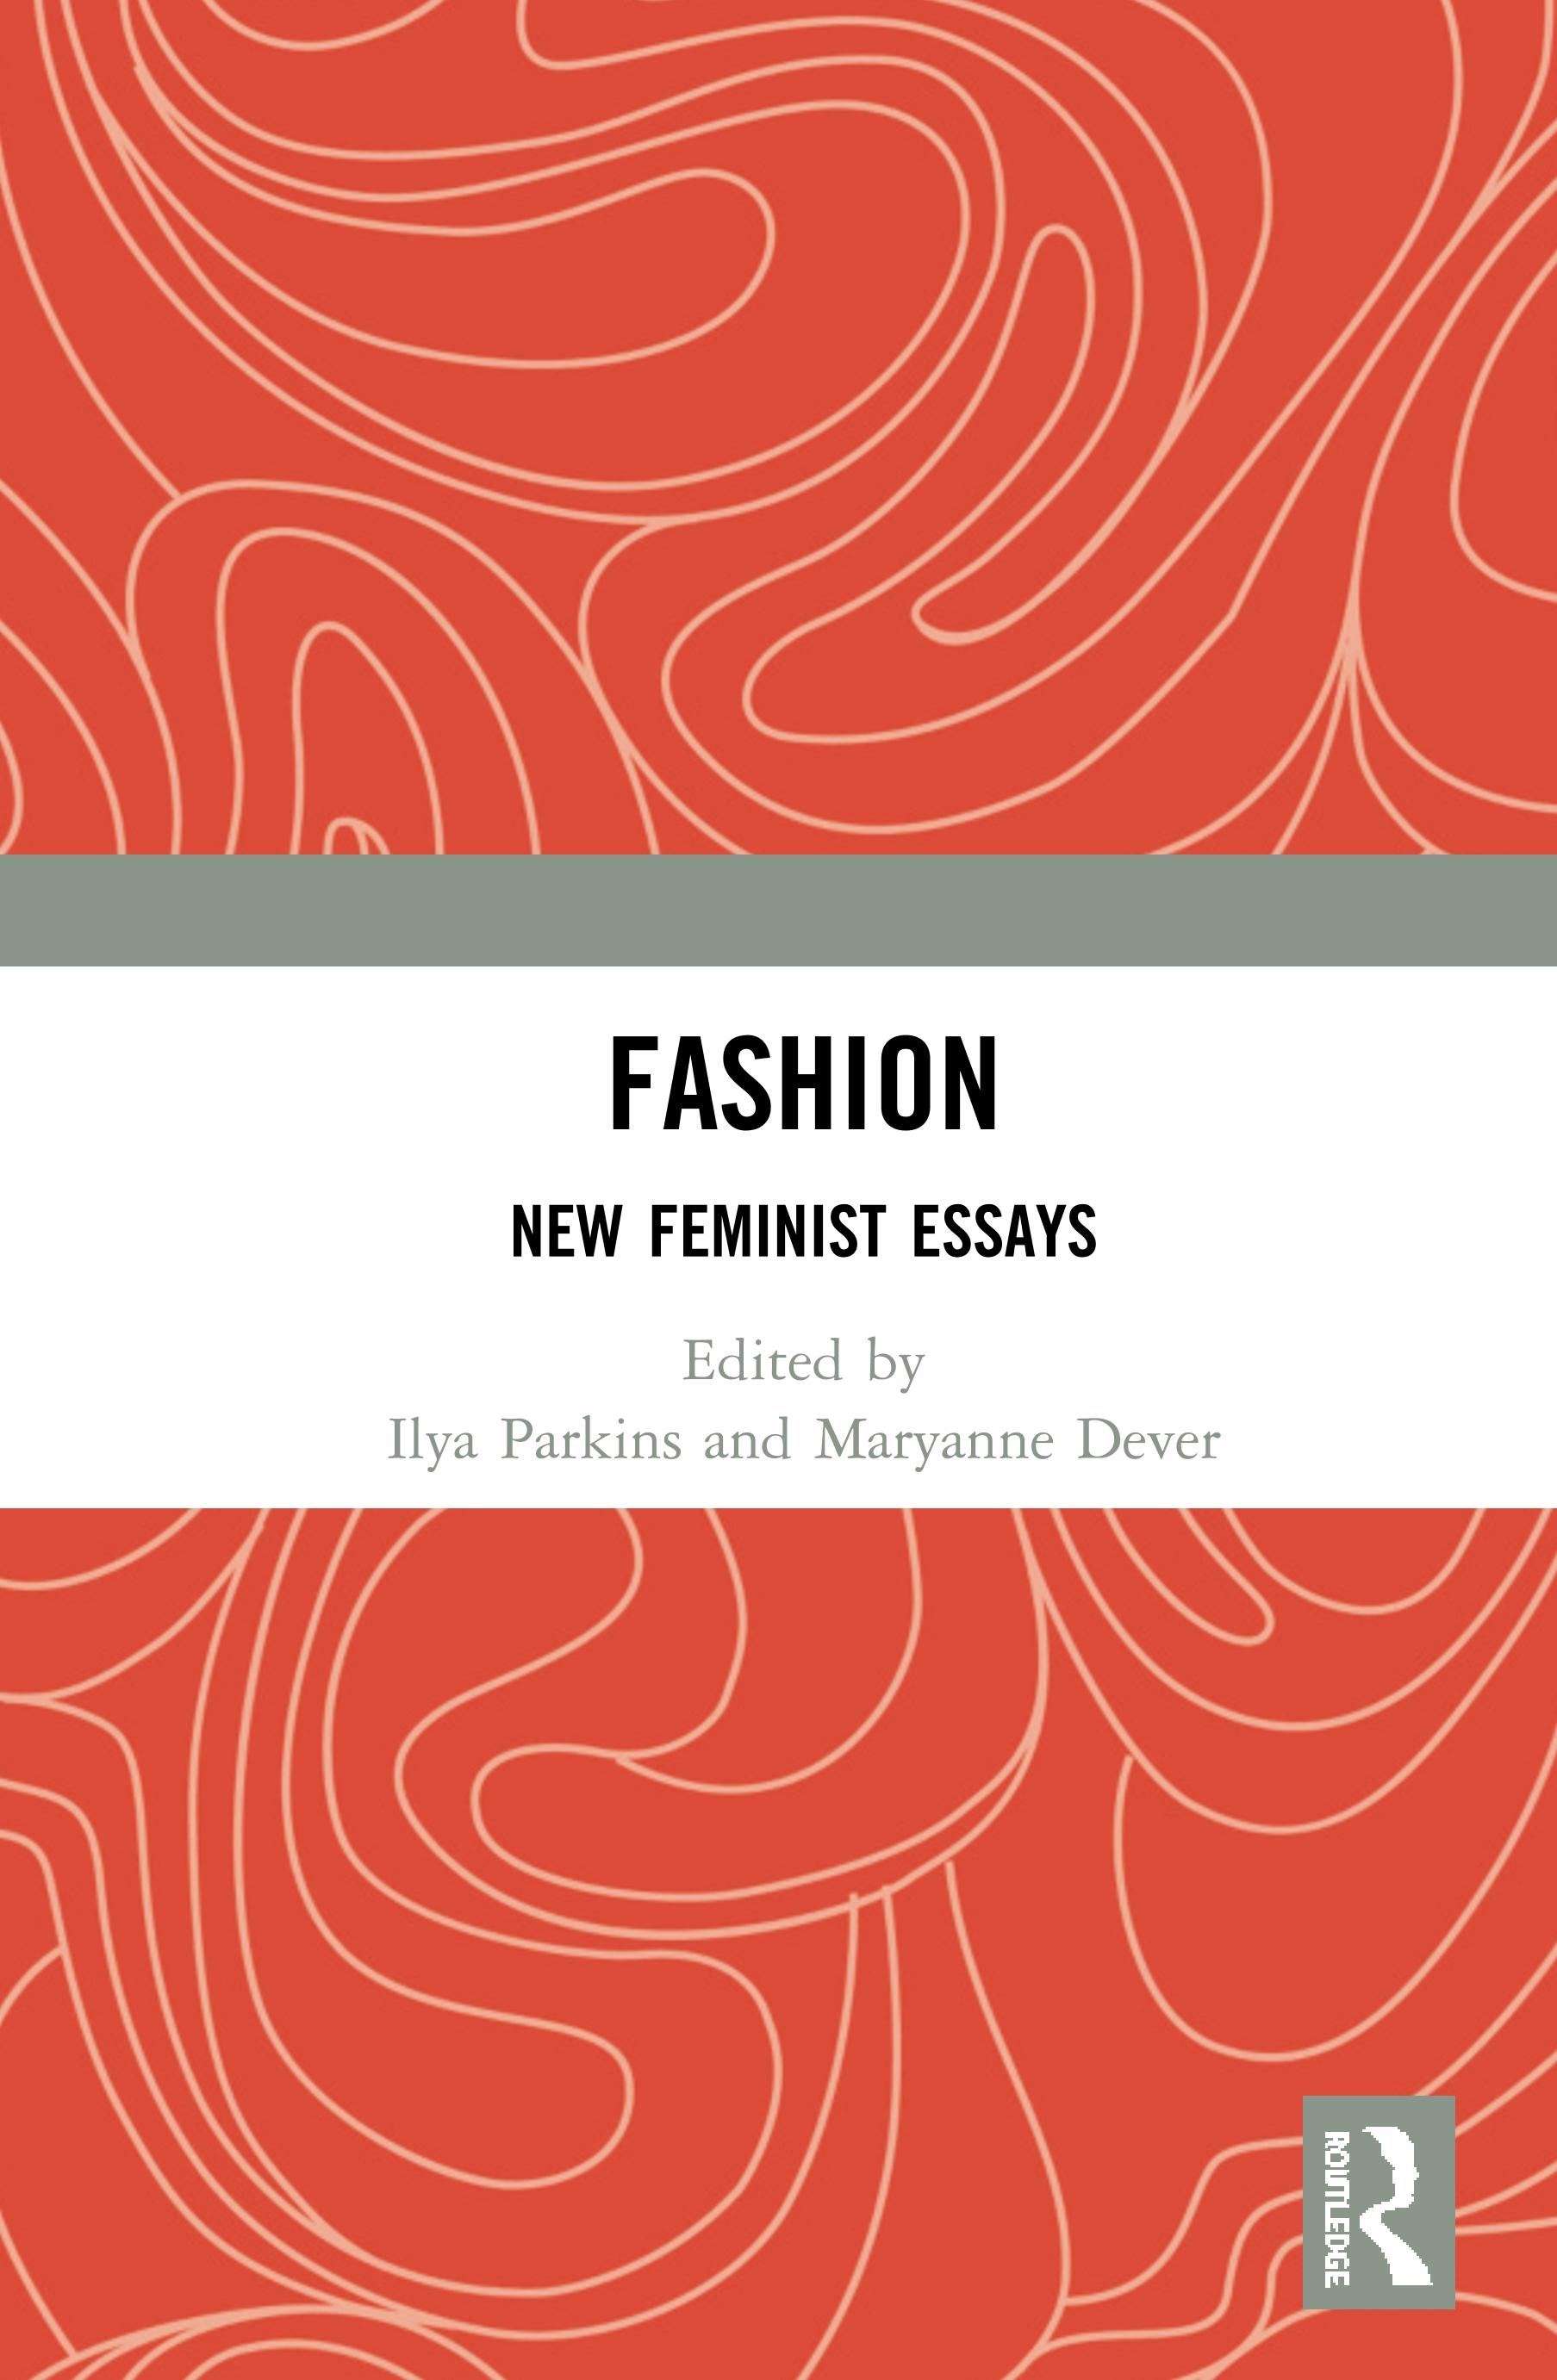 Fashion: New Feminist Essays book cover